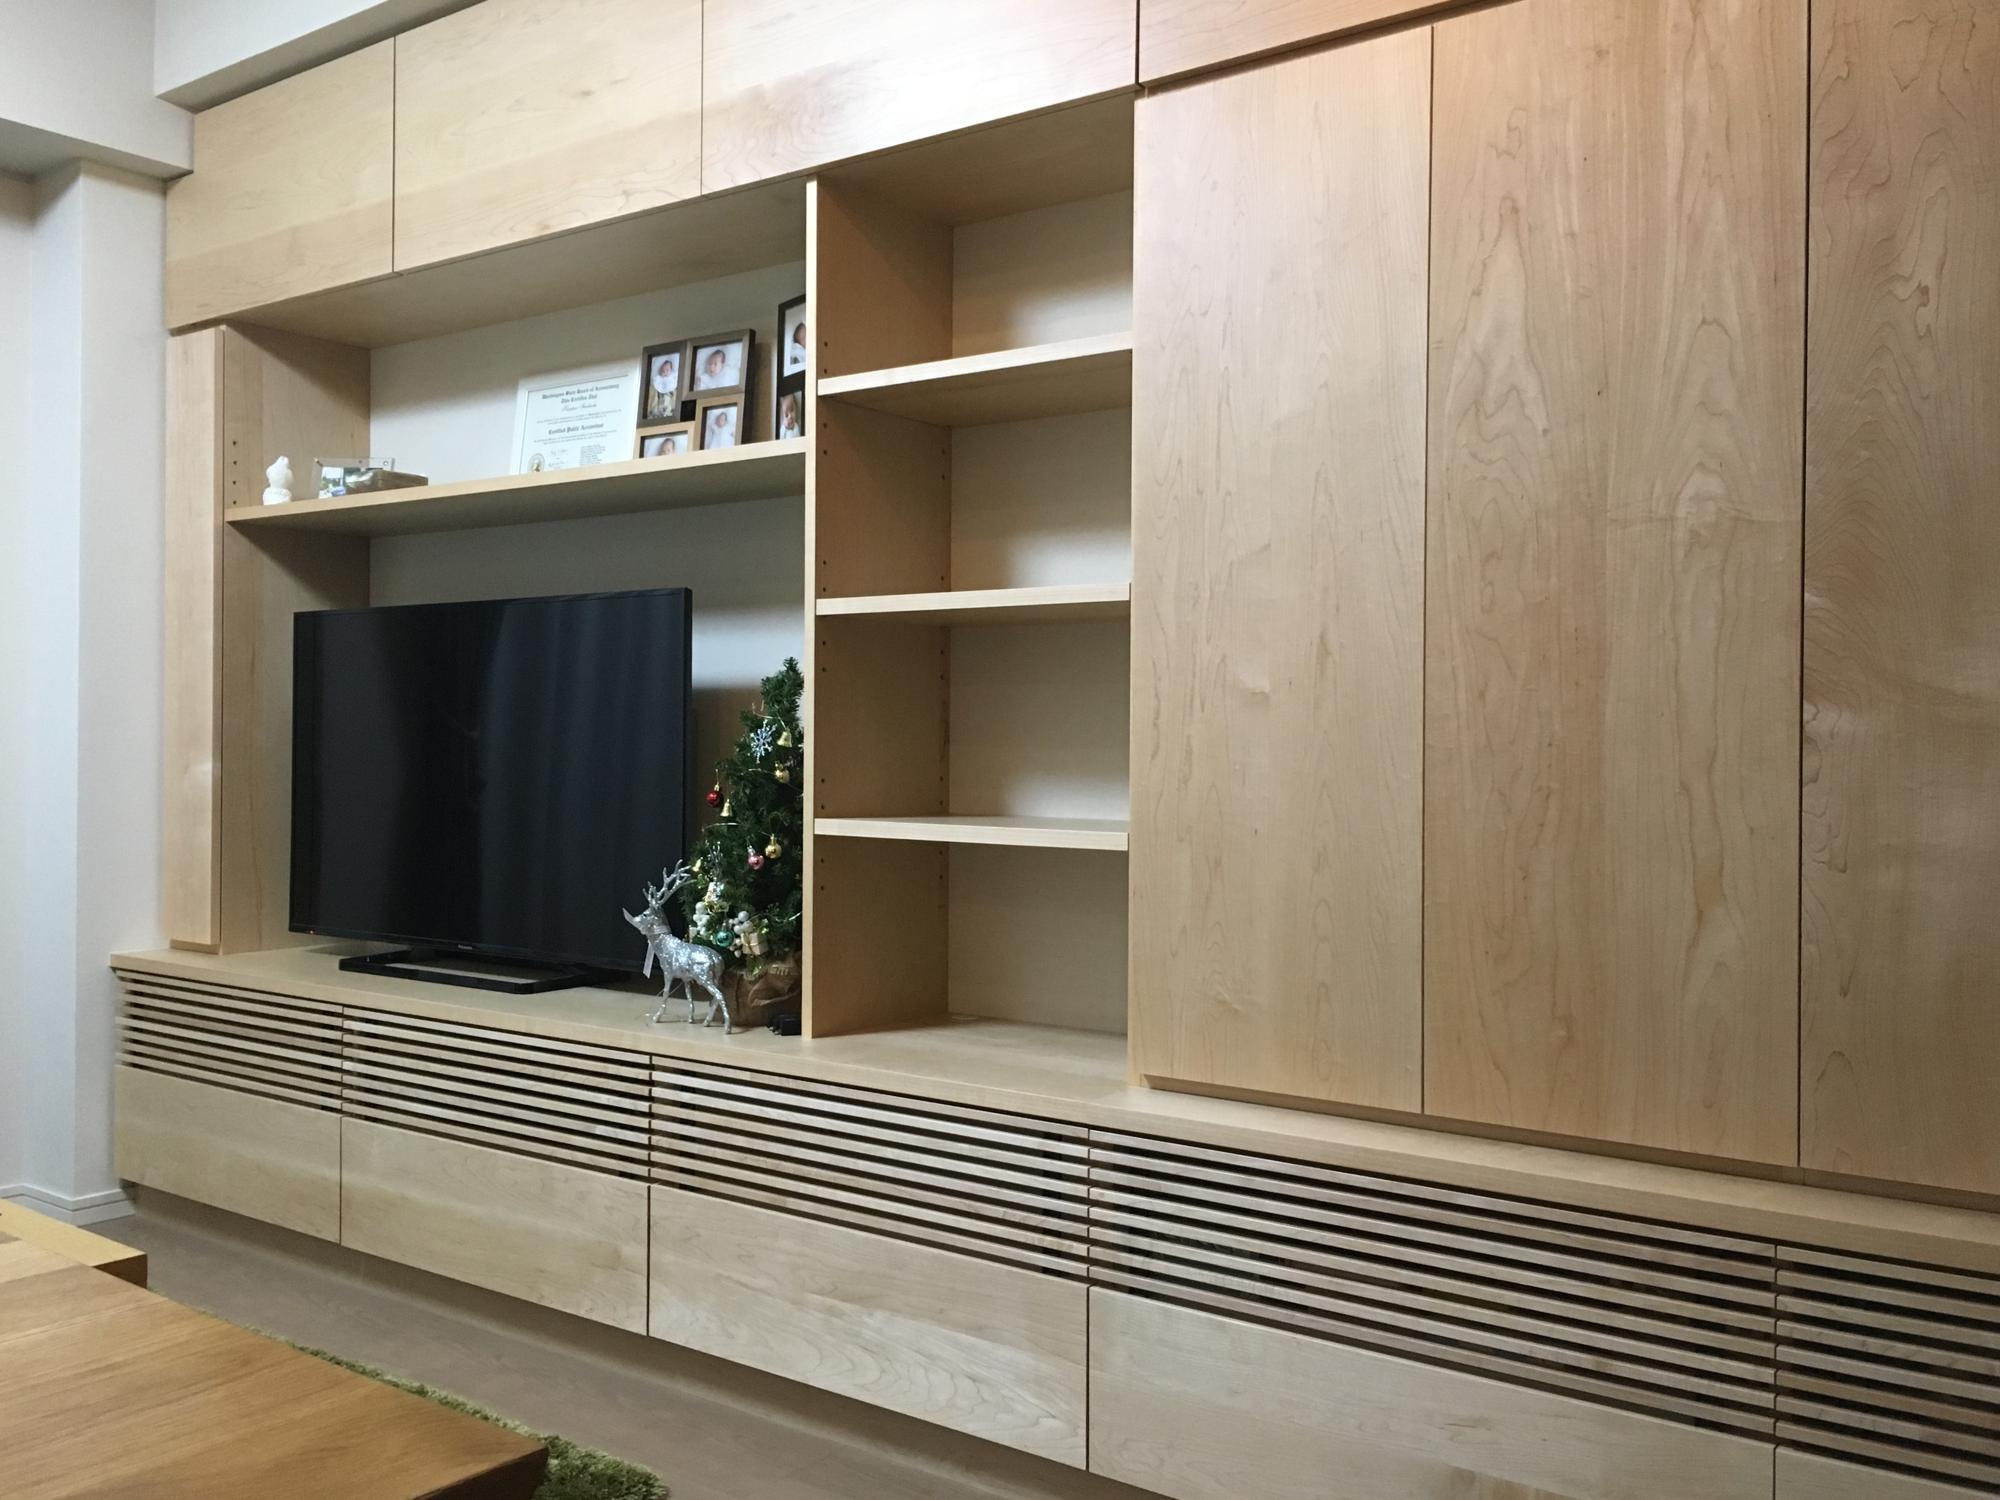 壁面収納 オーダー家具